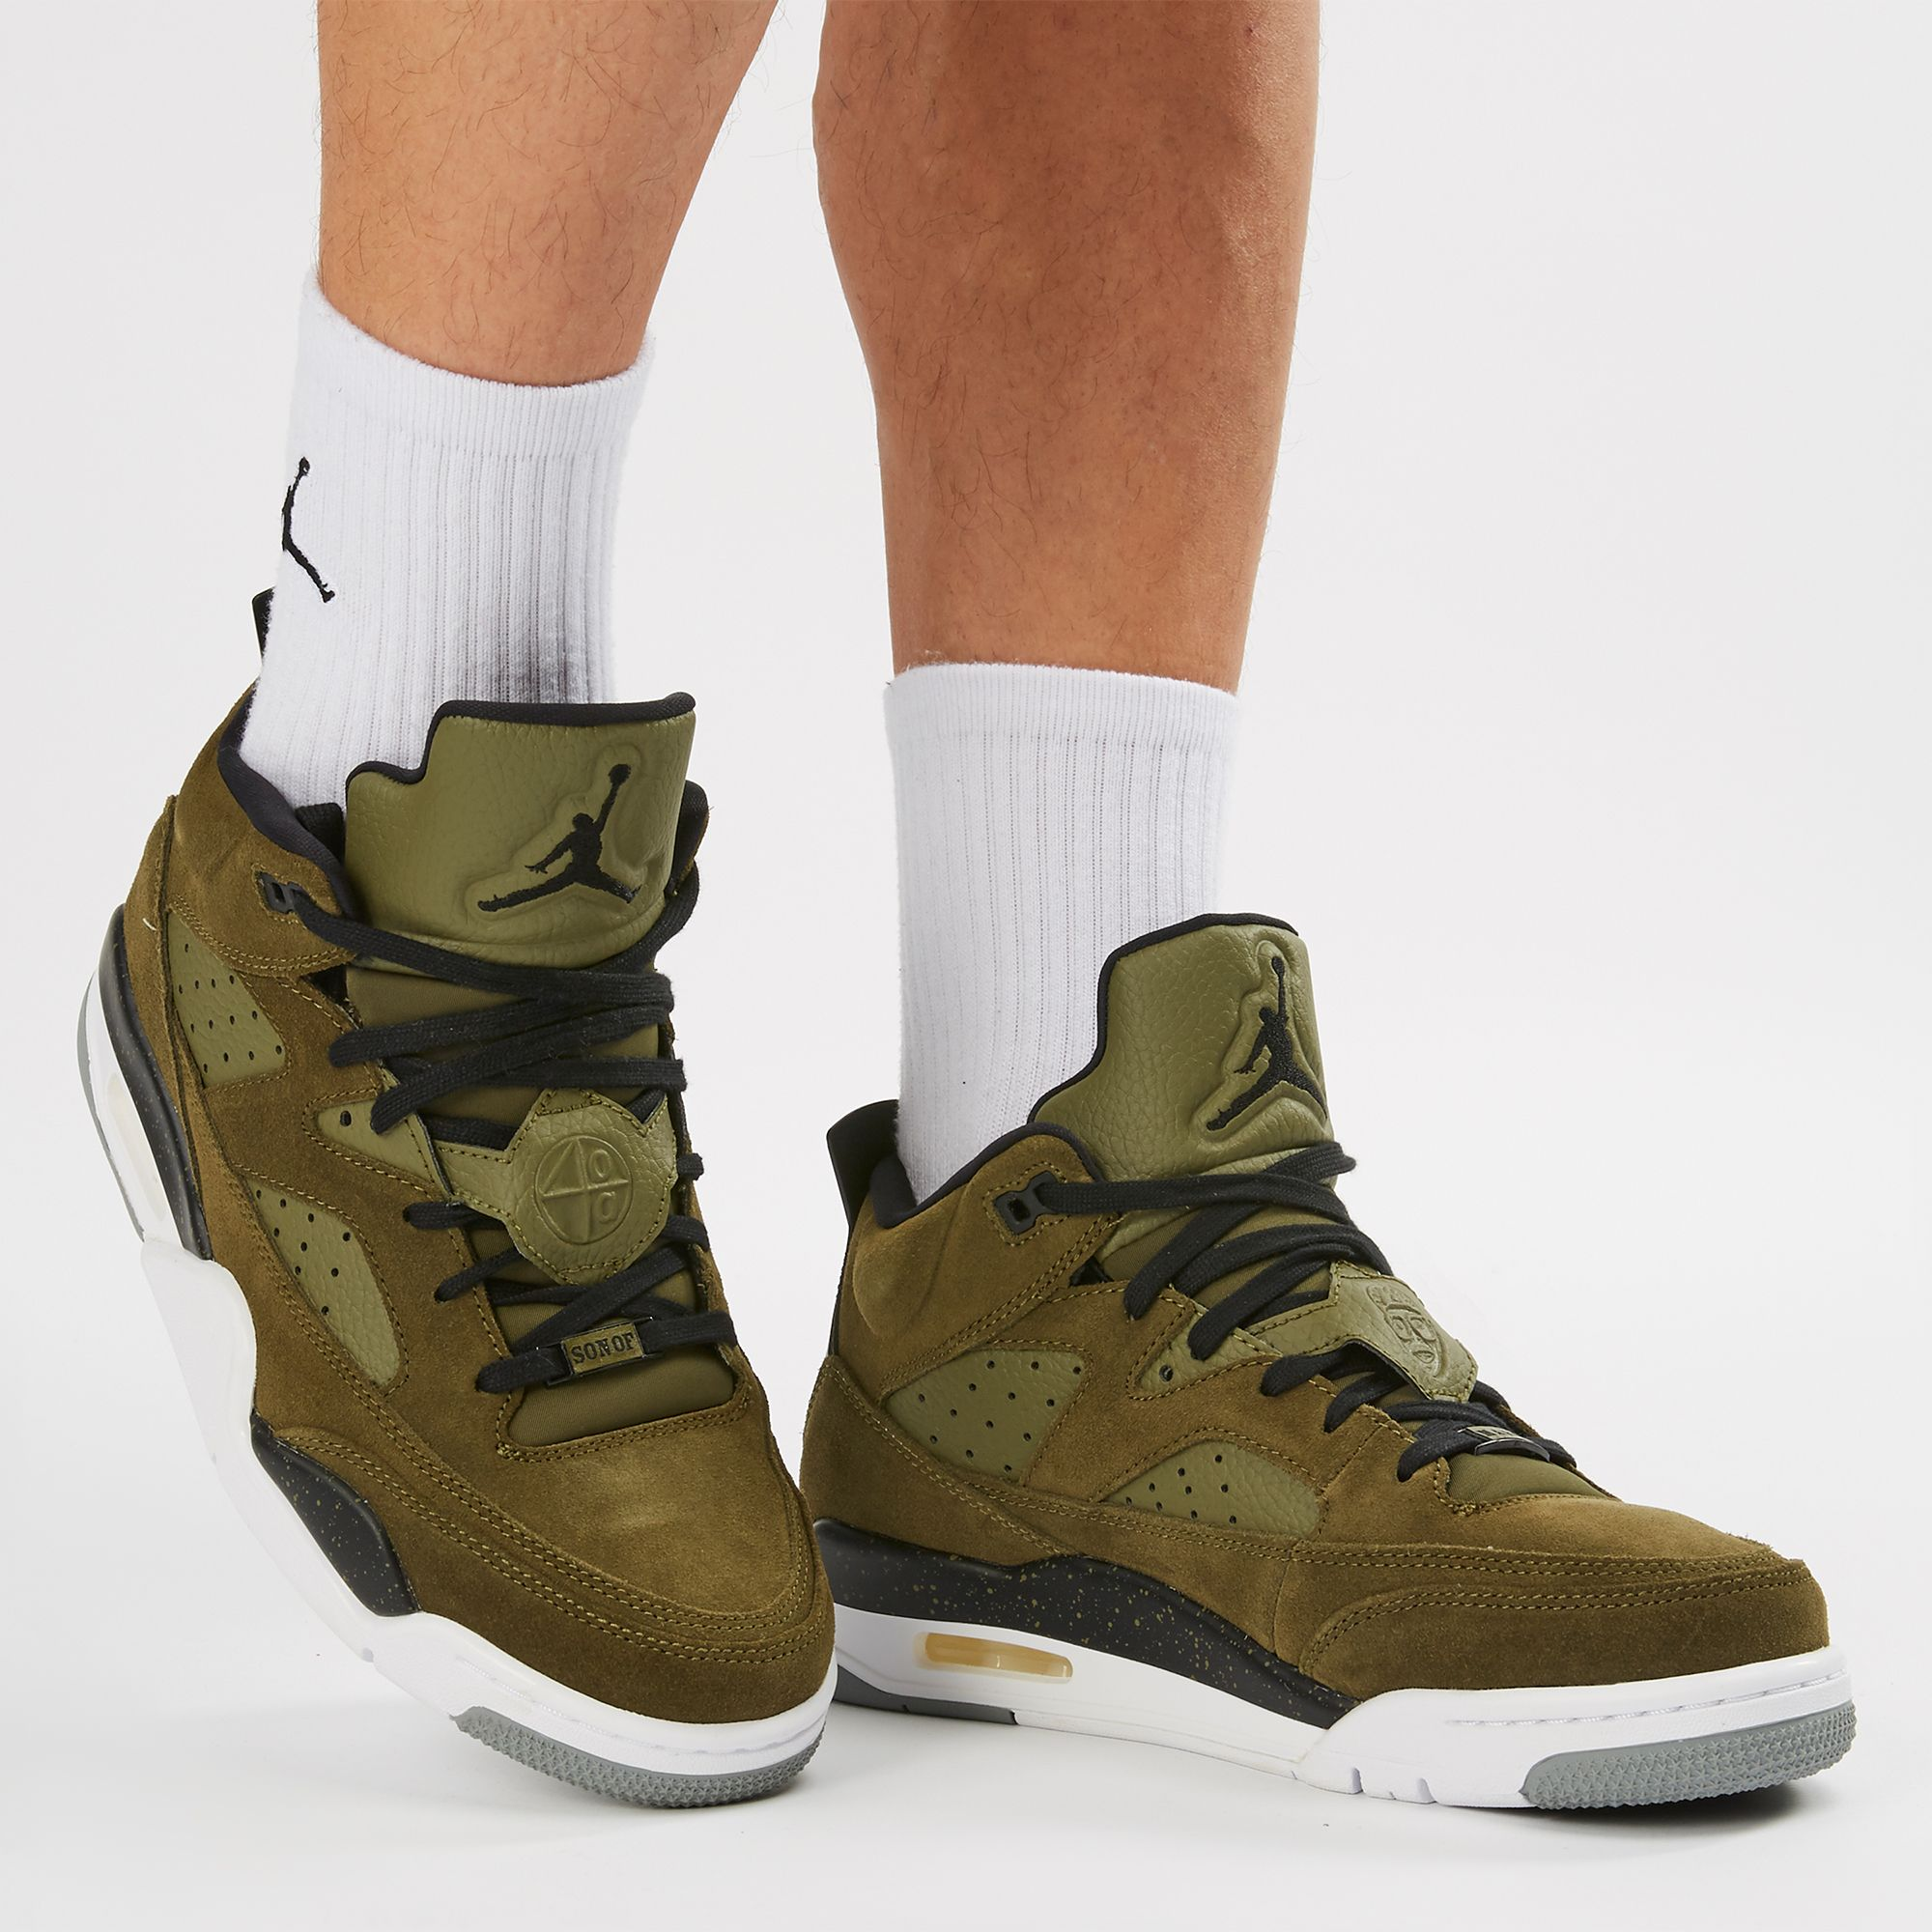 33571d9103a Jordan Son of Mars Low Shoe | Sneakers | Shoes | Mens | SSS